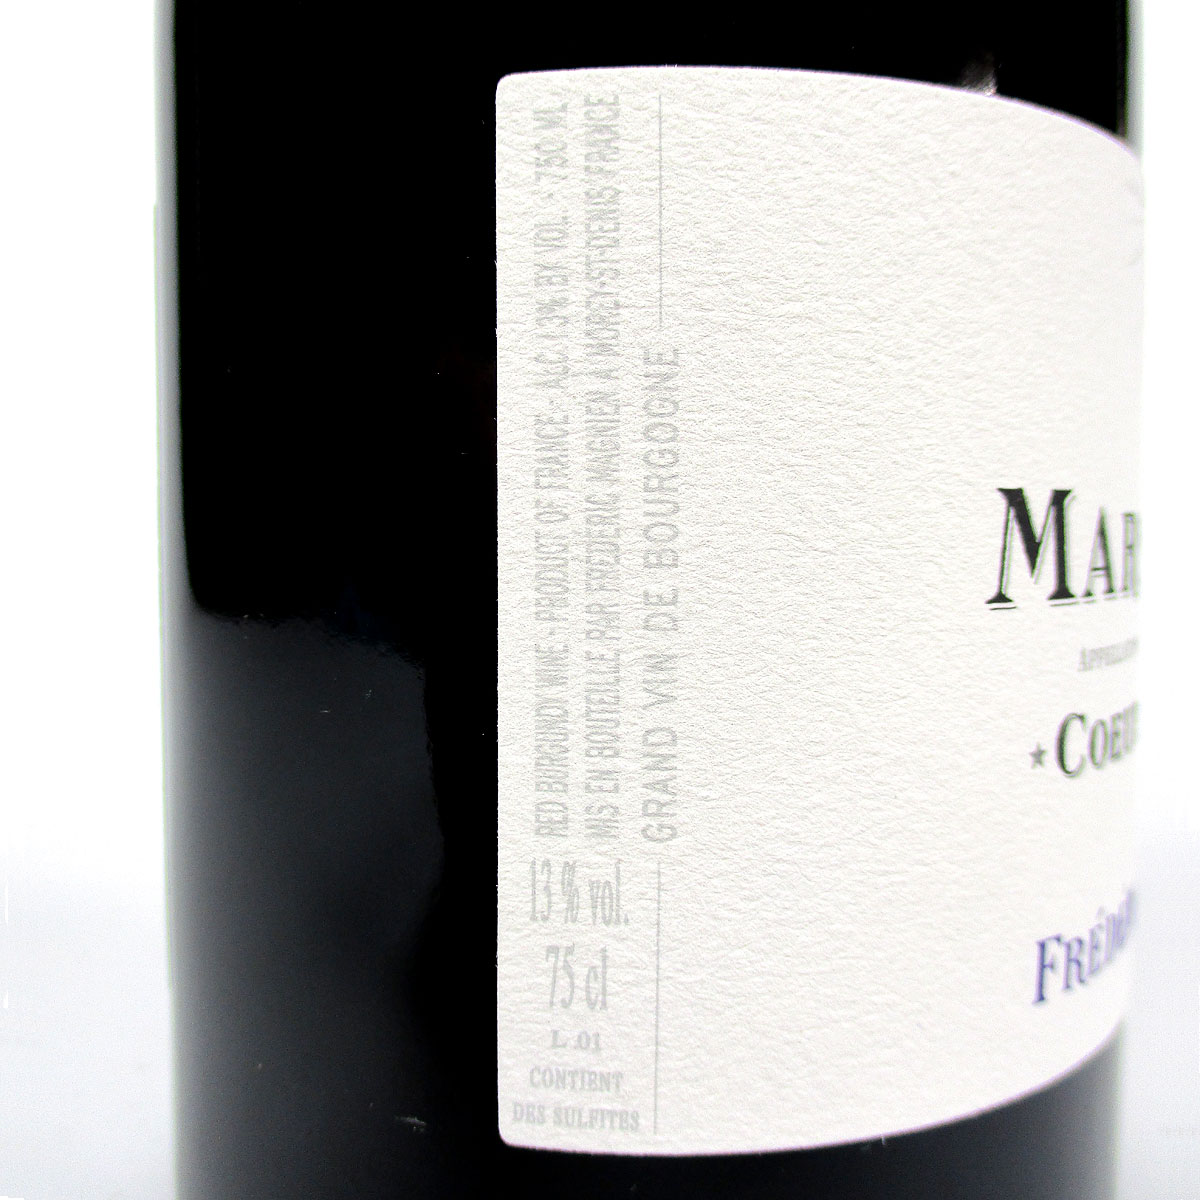 Marsannay: Frédéric Magnien 'Coeur d'Argile' 2019 - Bottle Side Label